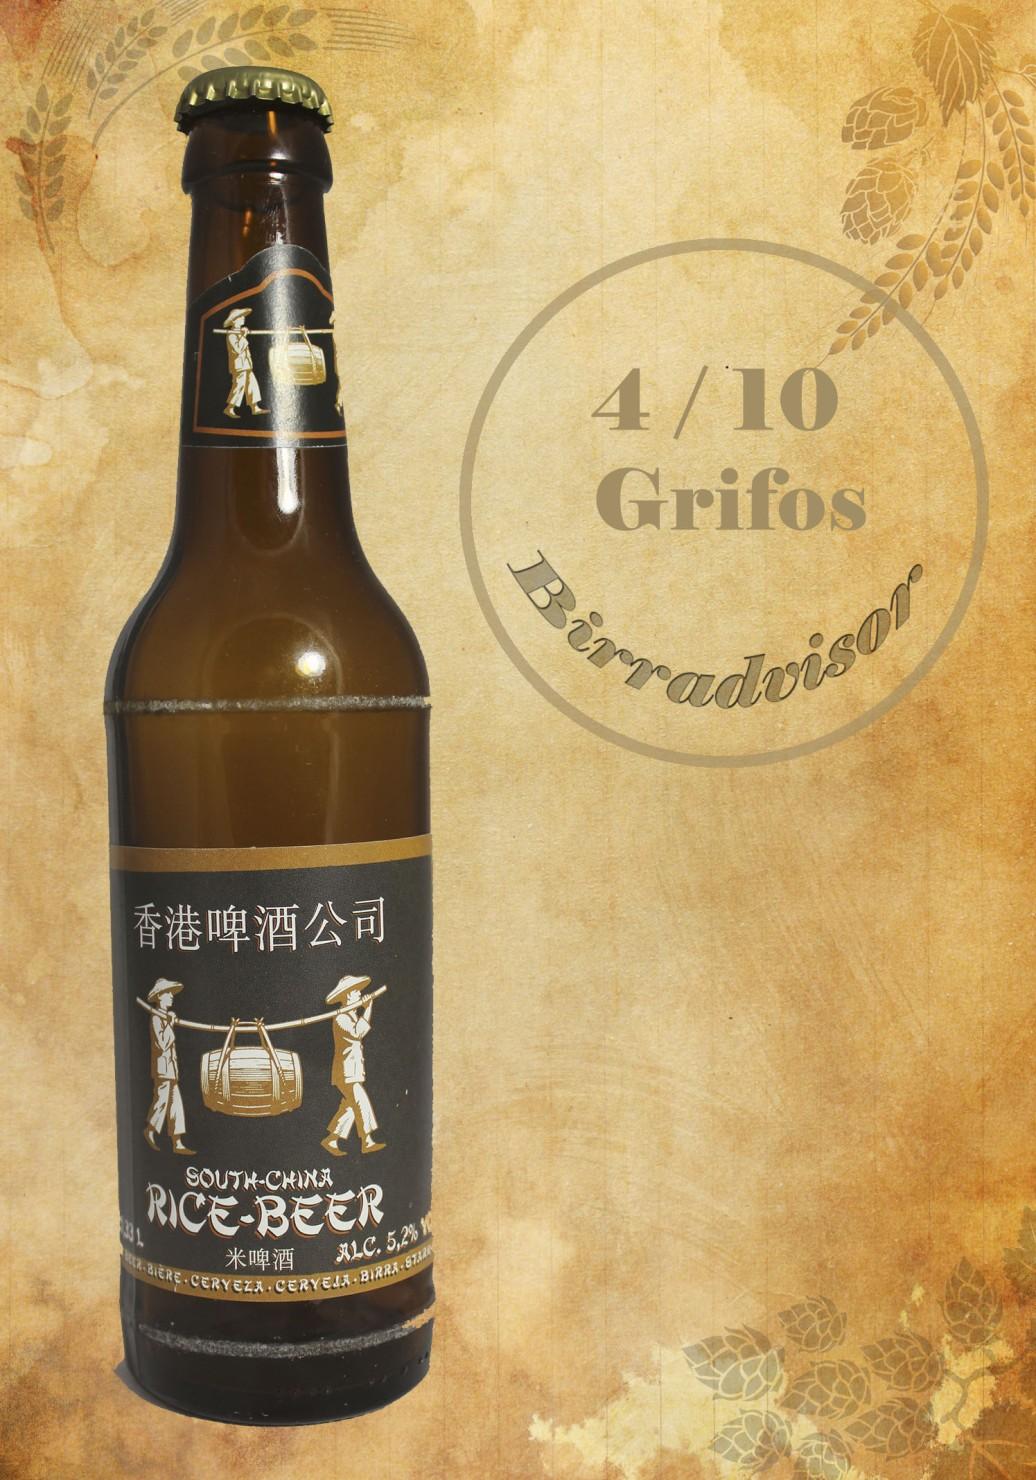 Rice-Beer